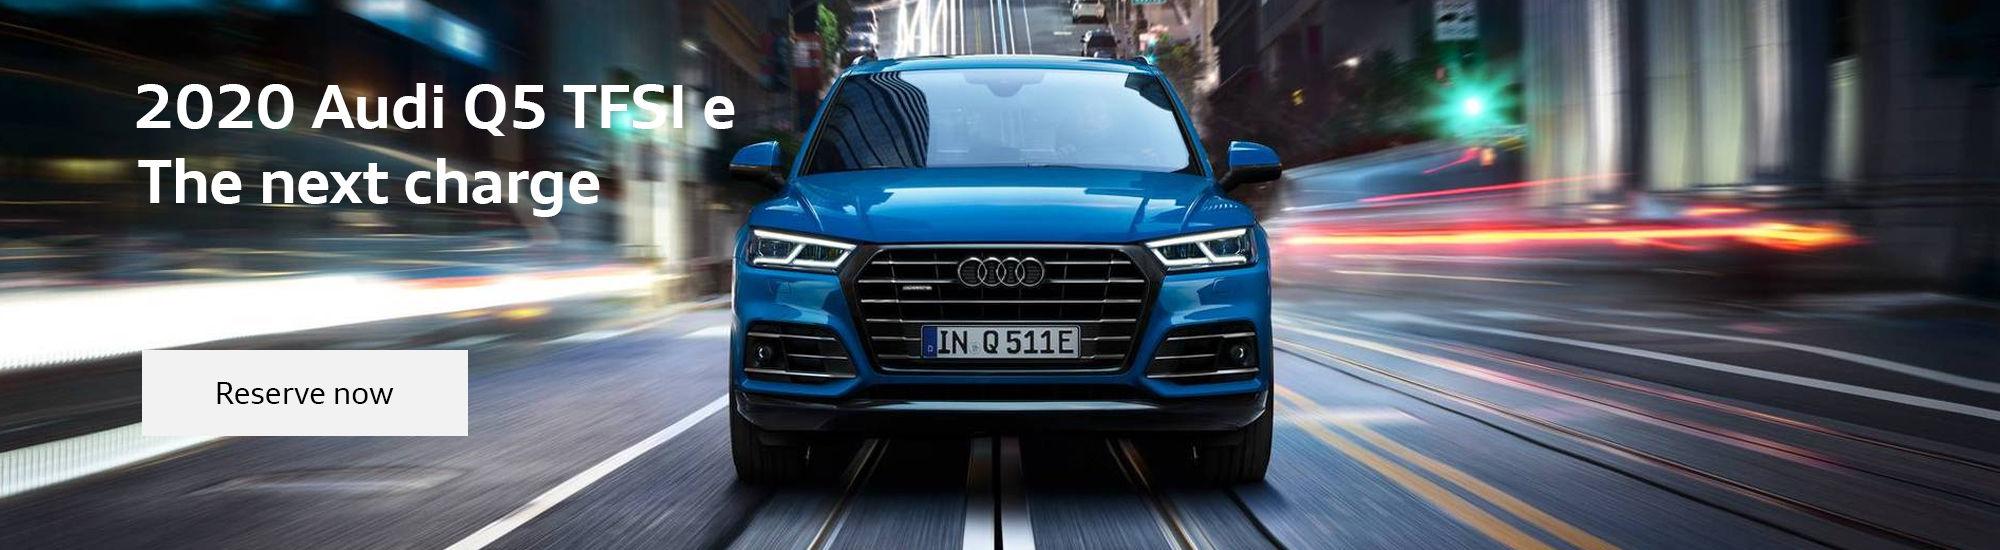 The all-new 2020 Audi Q5 TFSI e (Copy)